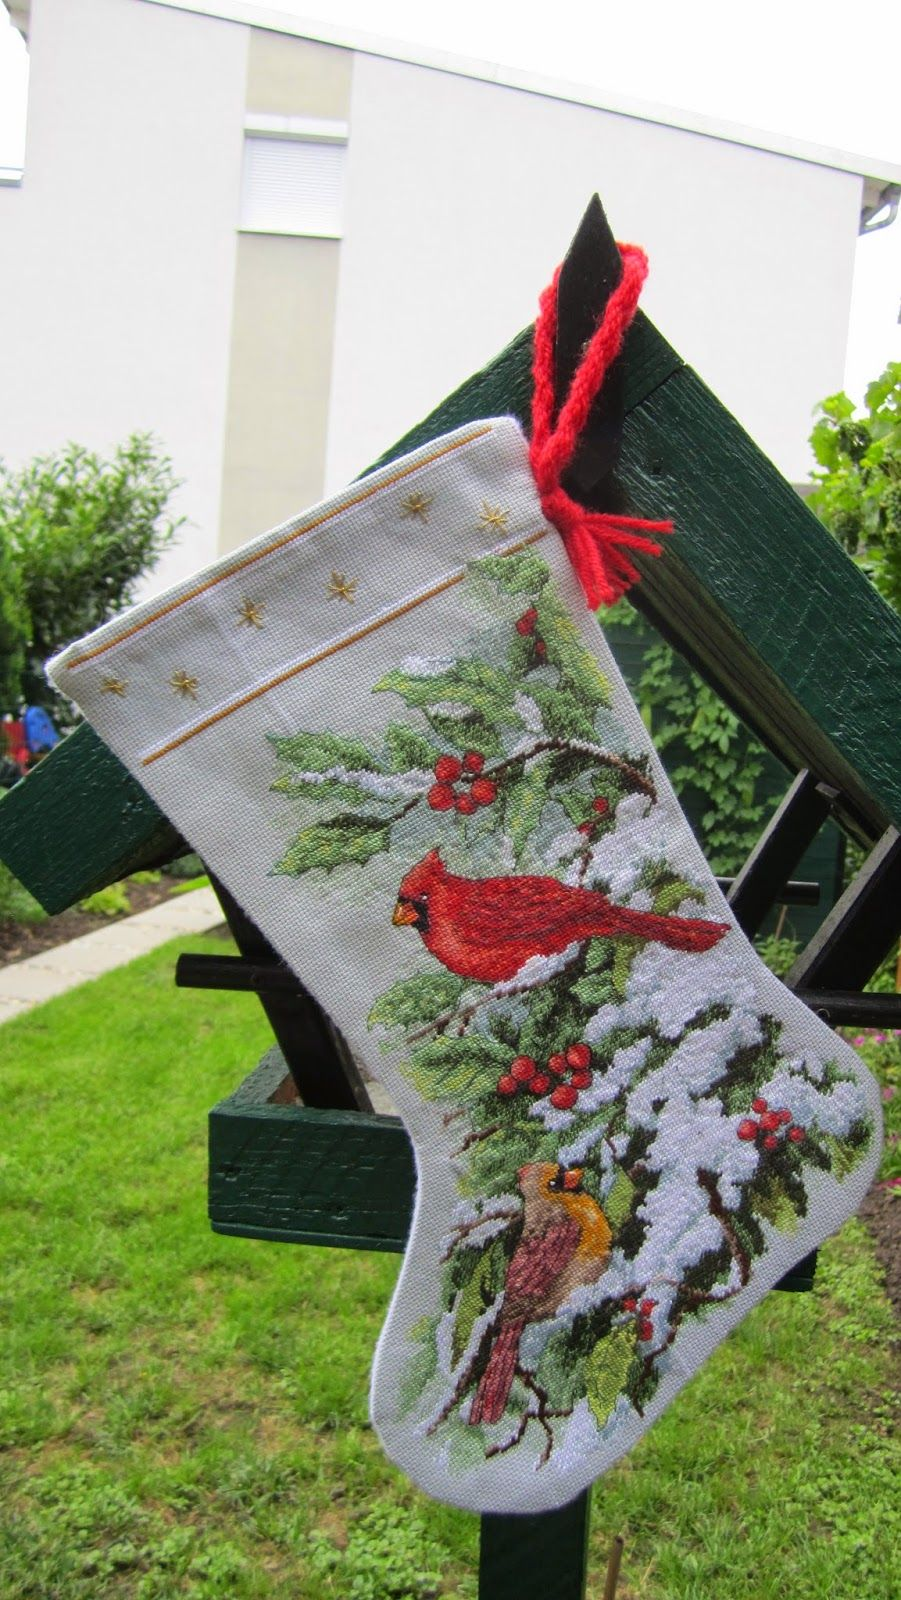 Santa Stocking Atlantisetta´s Tageswerke - mein Handarbeitsblog